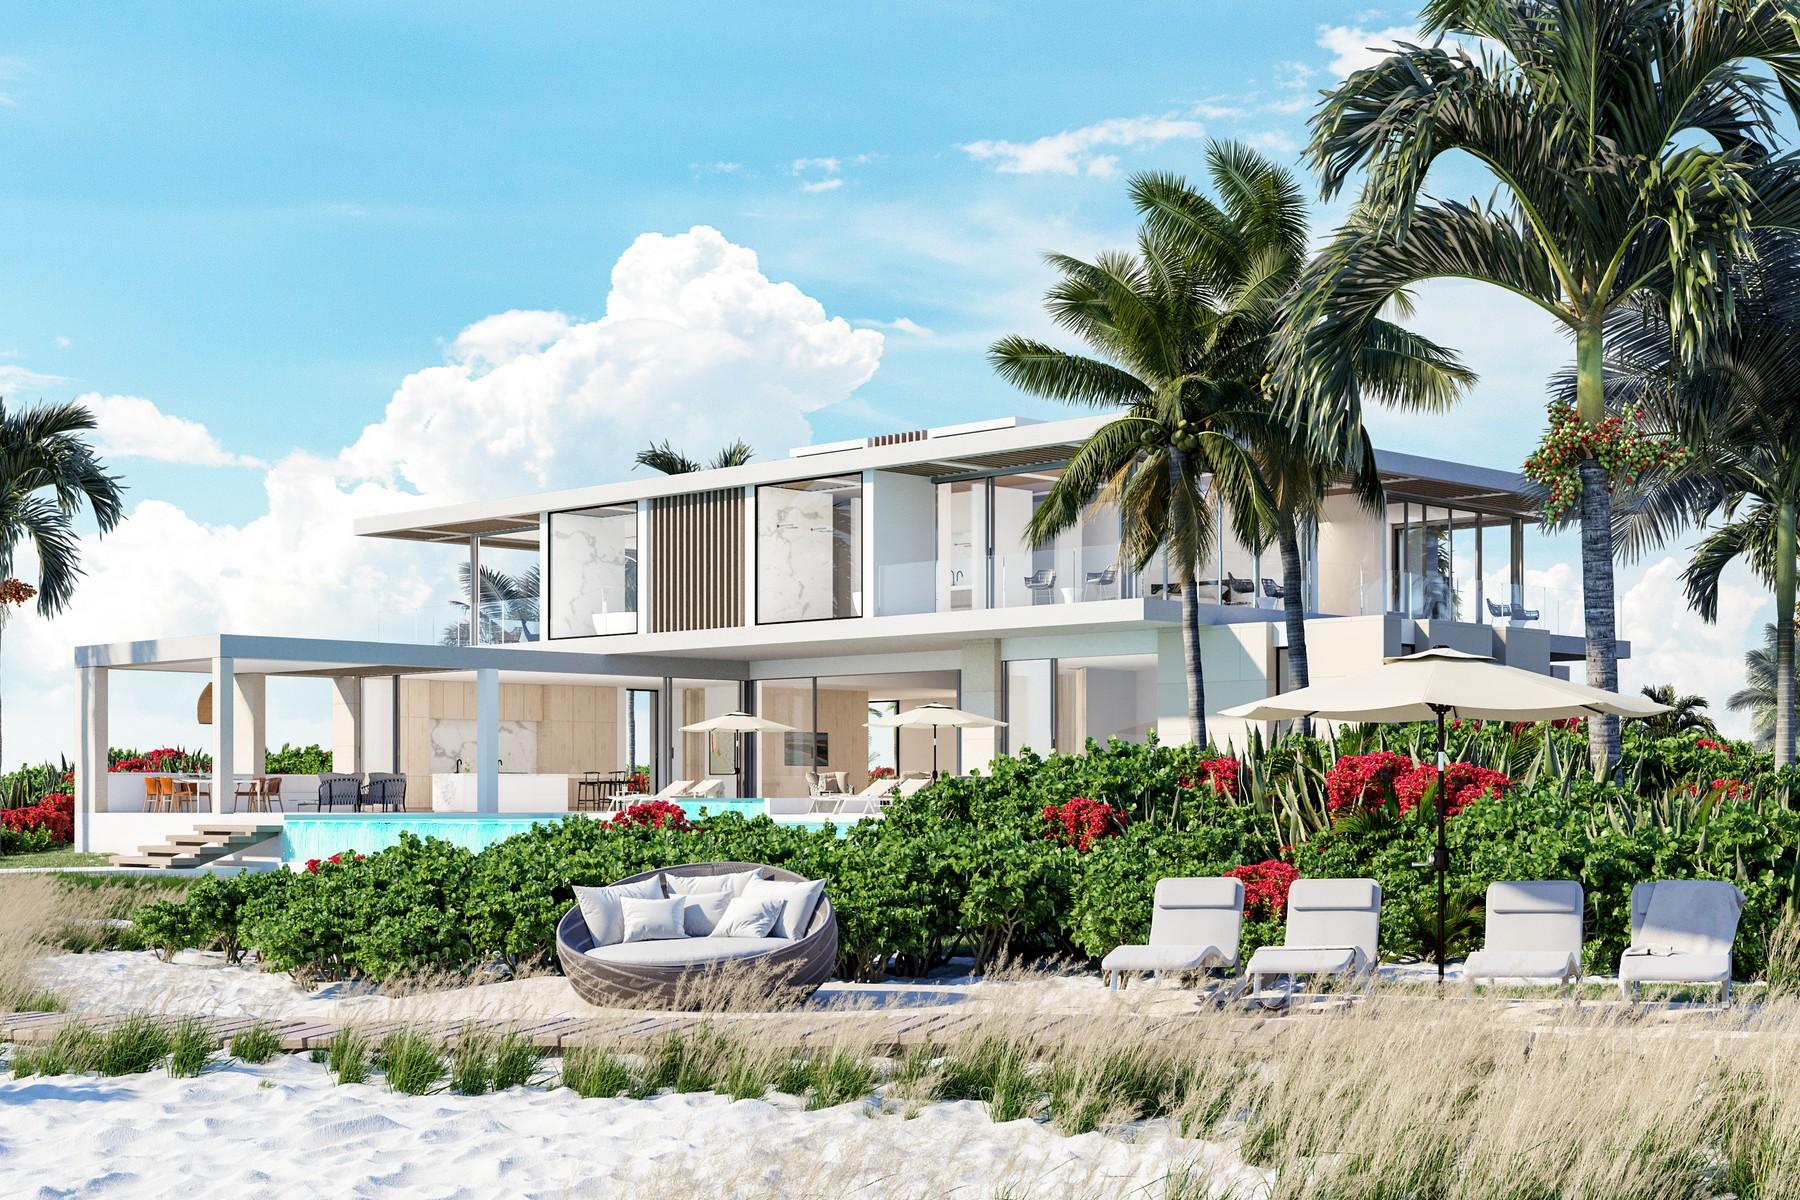 Single Family Homes por un Venta en The Peninsula at Emerald Estate - Beach House 3 Emerald Point Beachfront Leeward, Providenciales TKCA 1ZZ Islas Turcas y Caicos